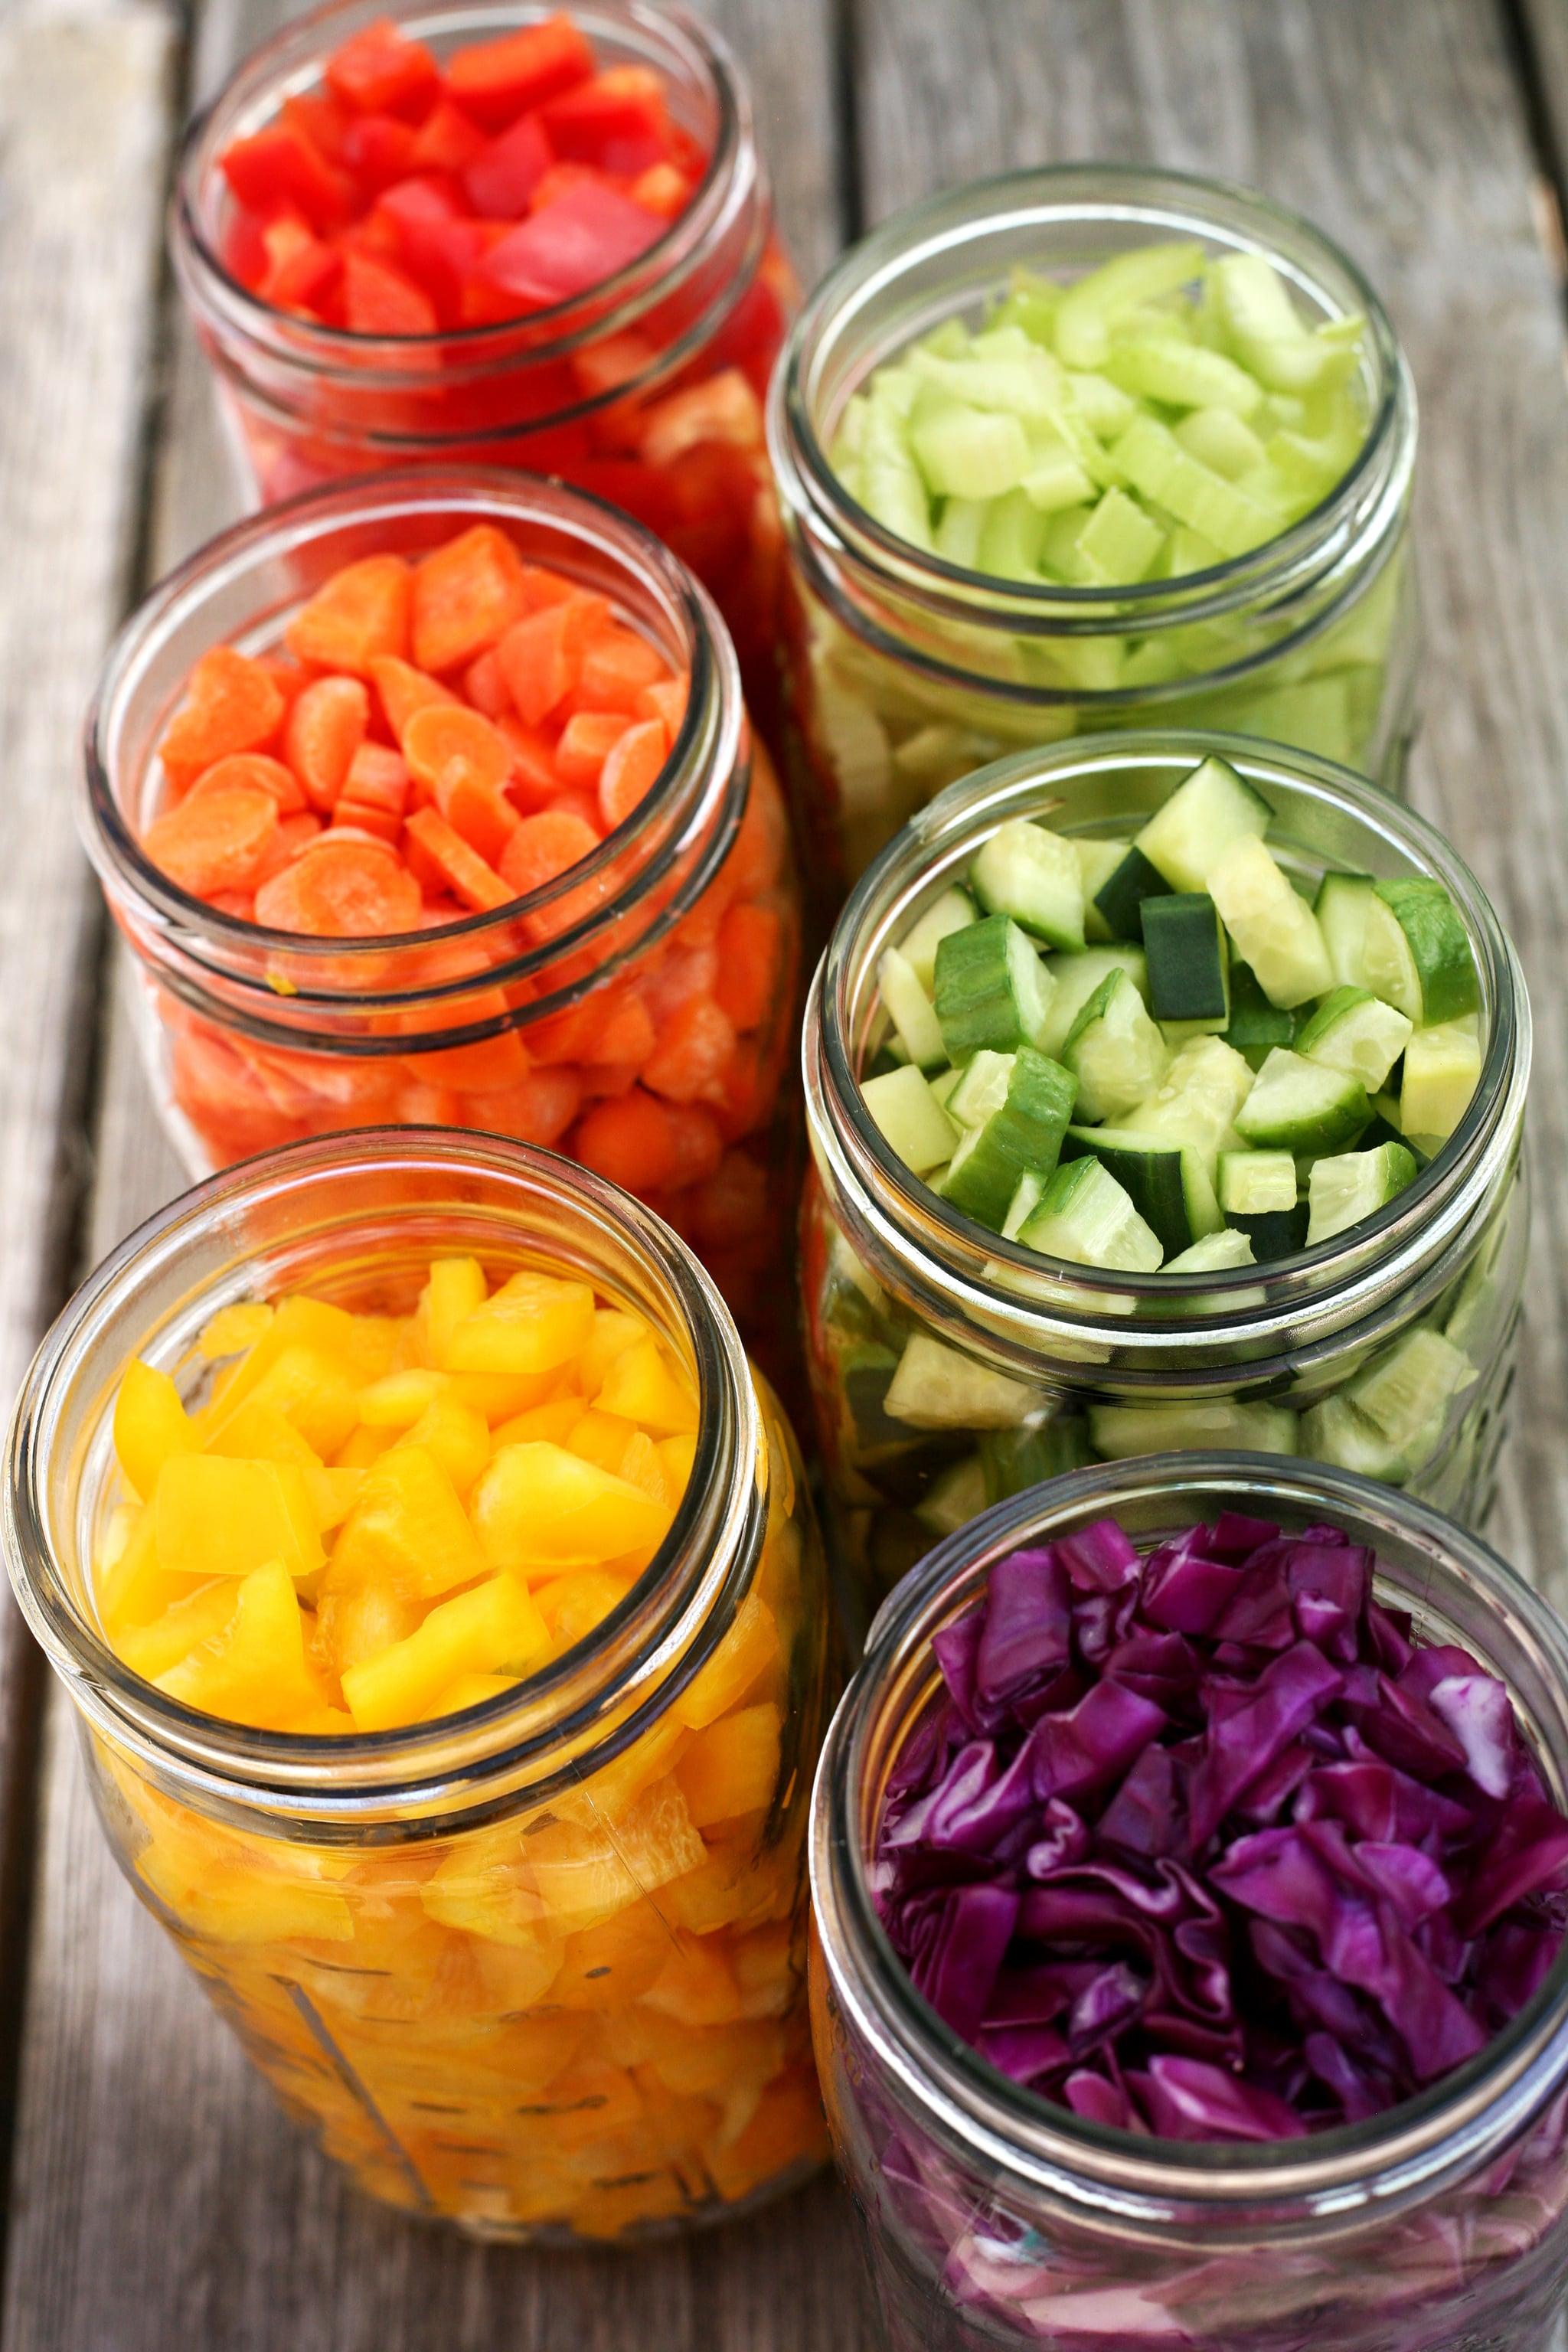 For All You Salad-Lovers! Try This DIY Mason Jar Salad Bar